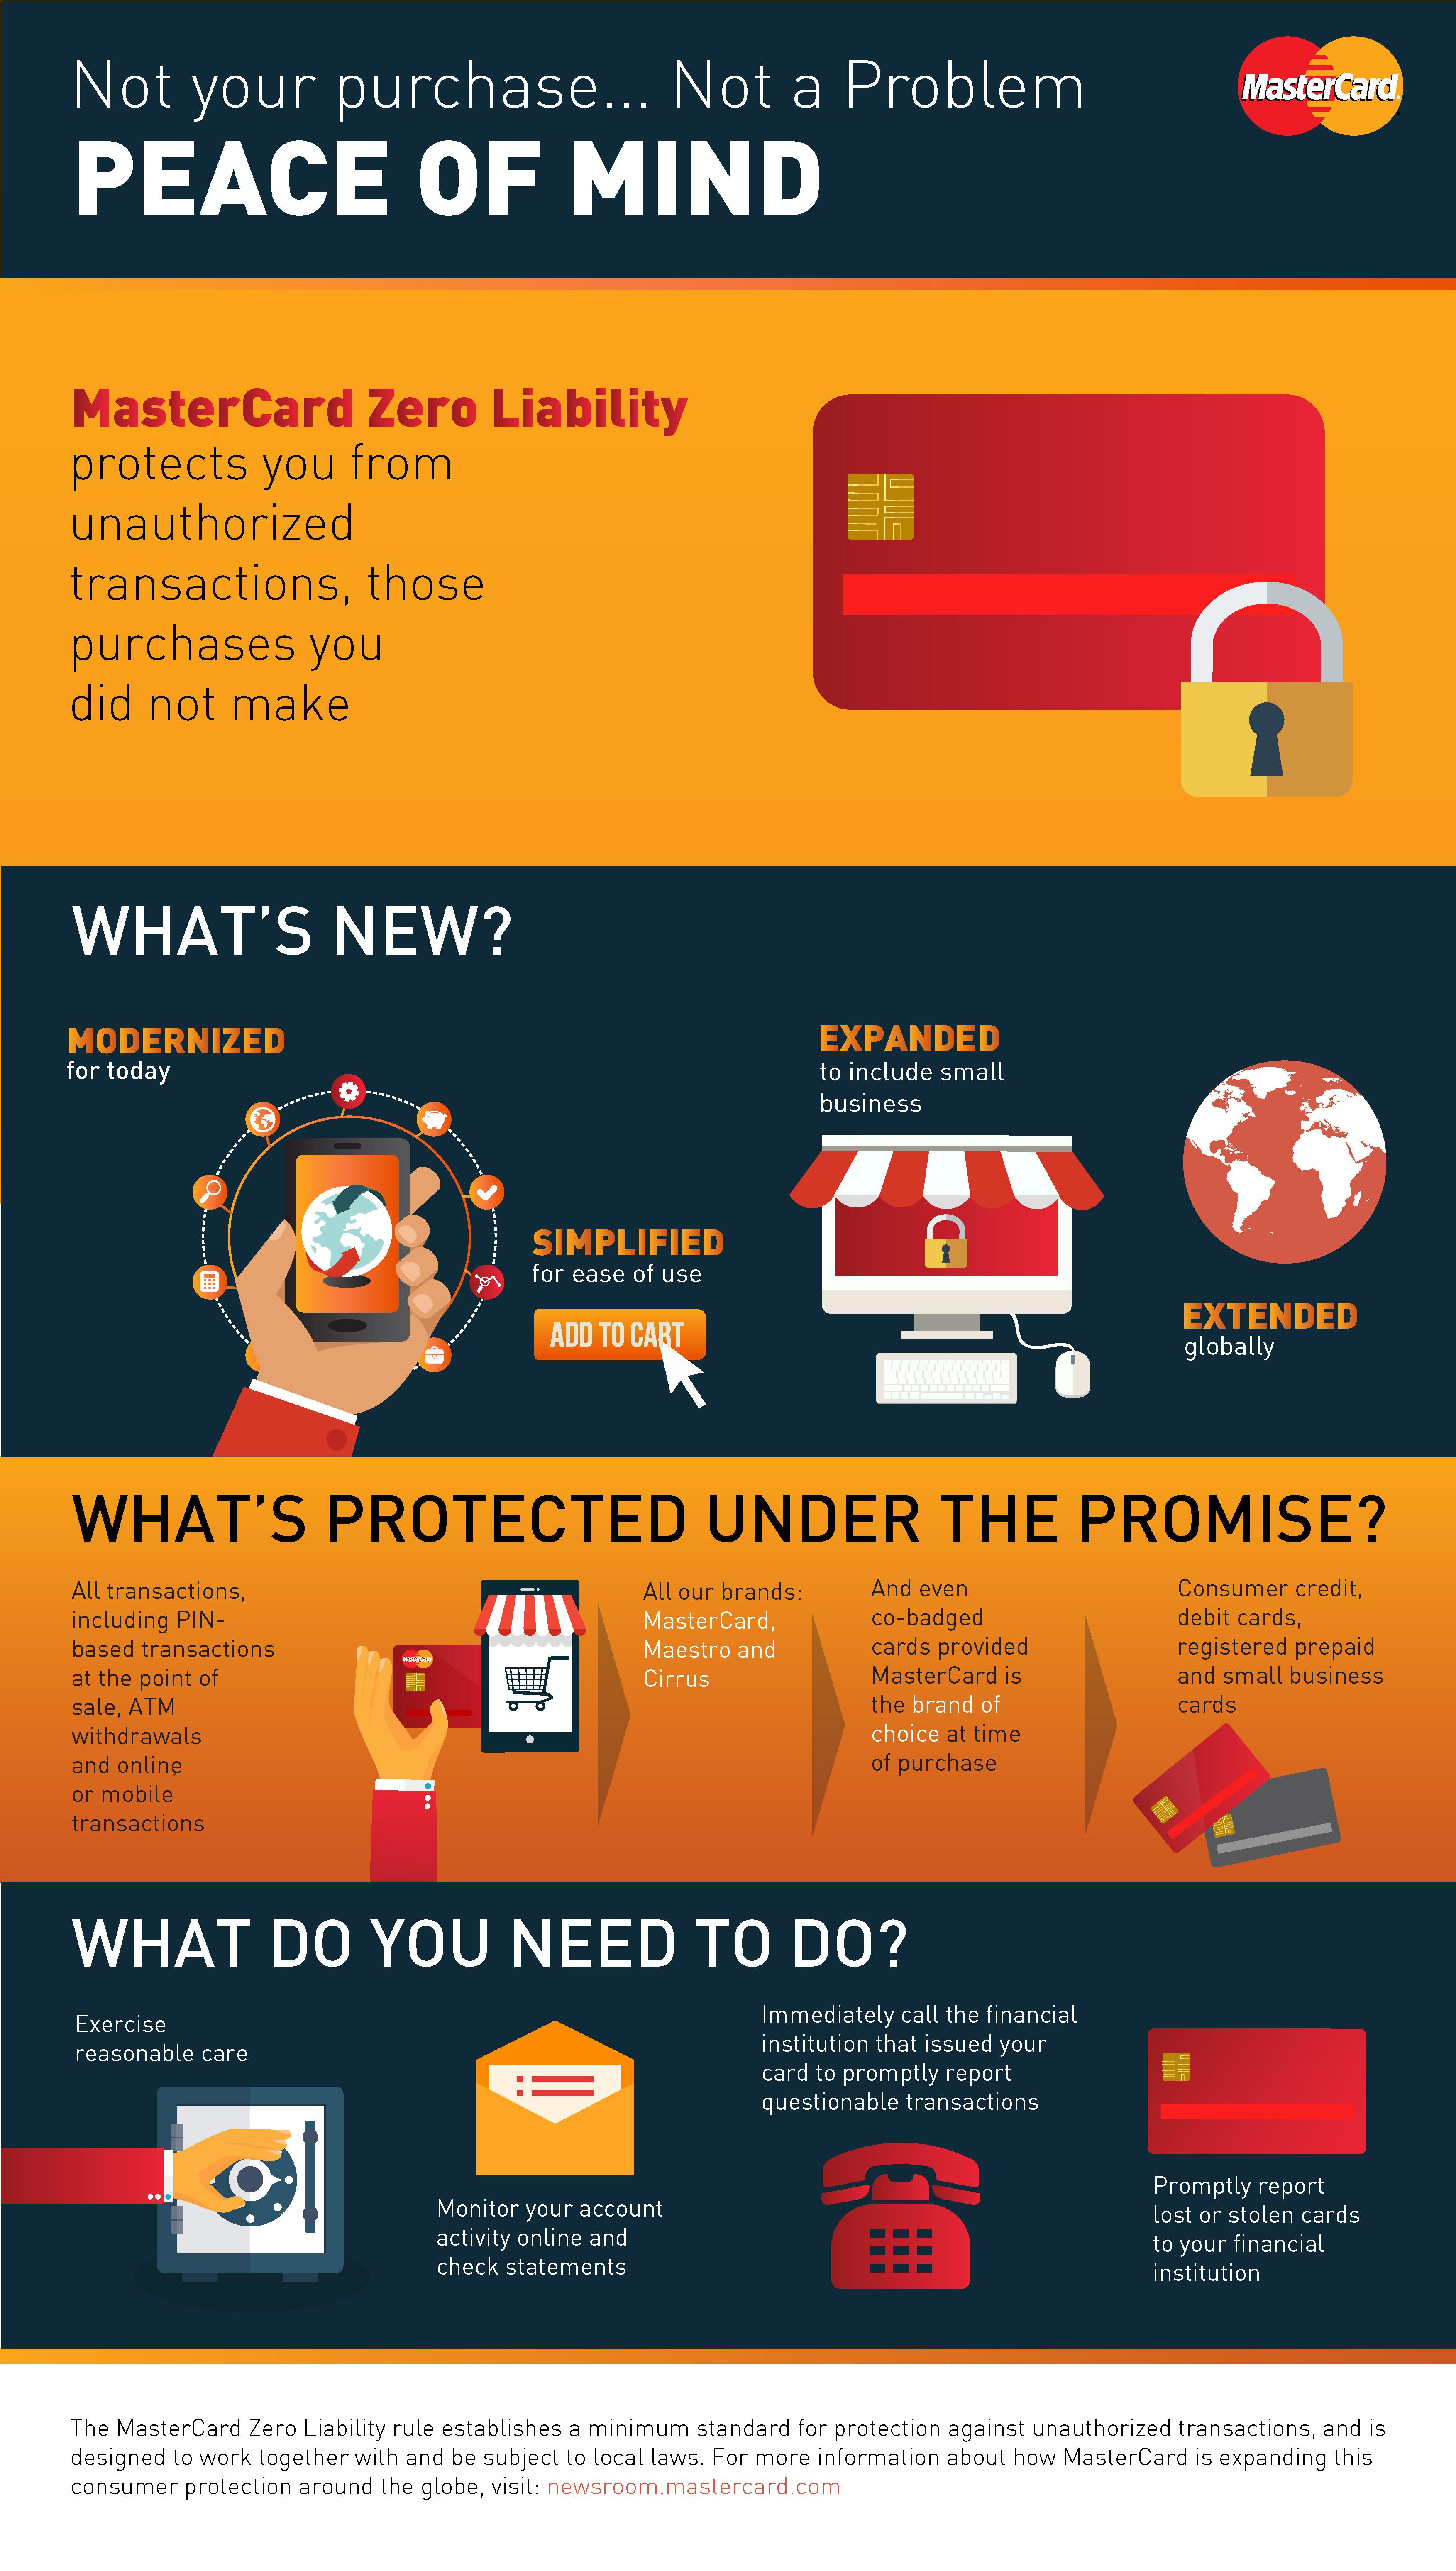 MasterCard Takes Zero Liability Global | PYMNTS.com